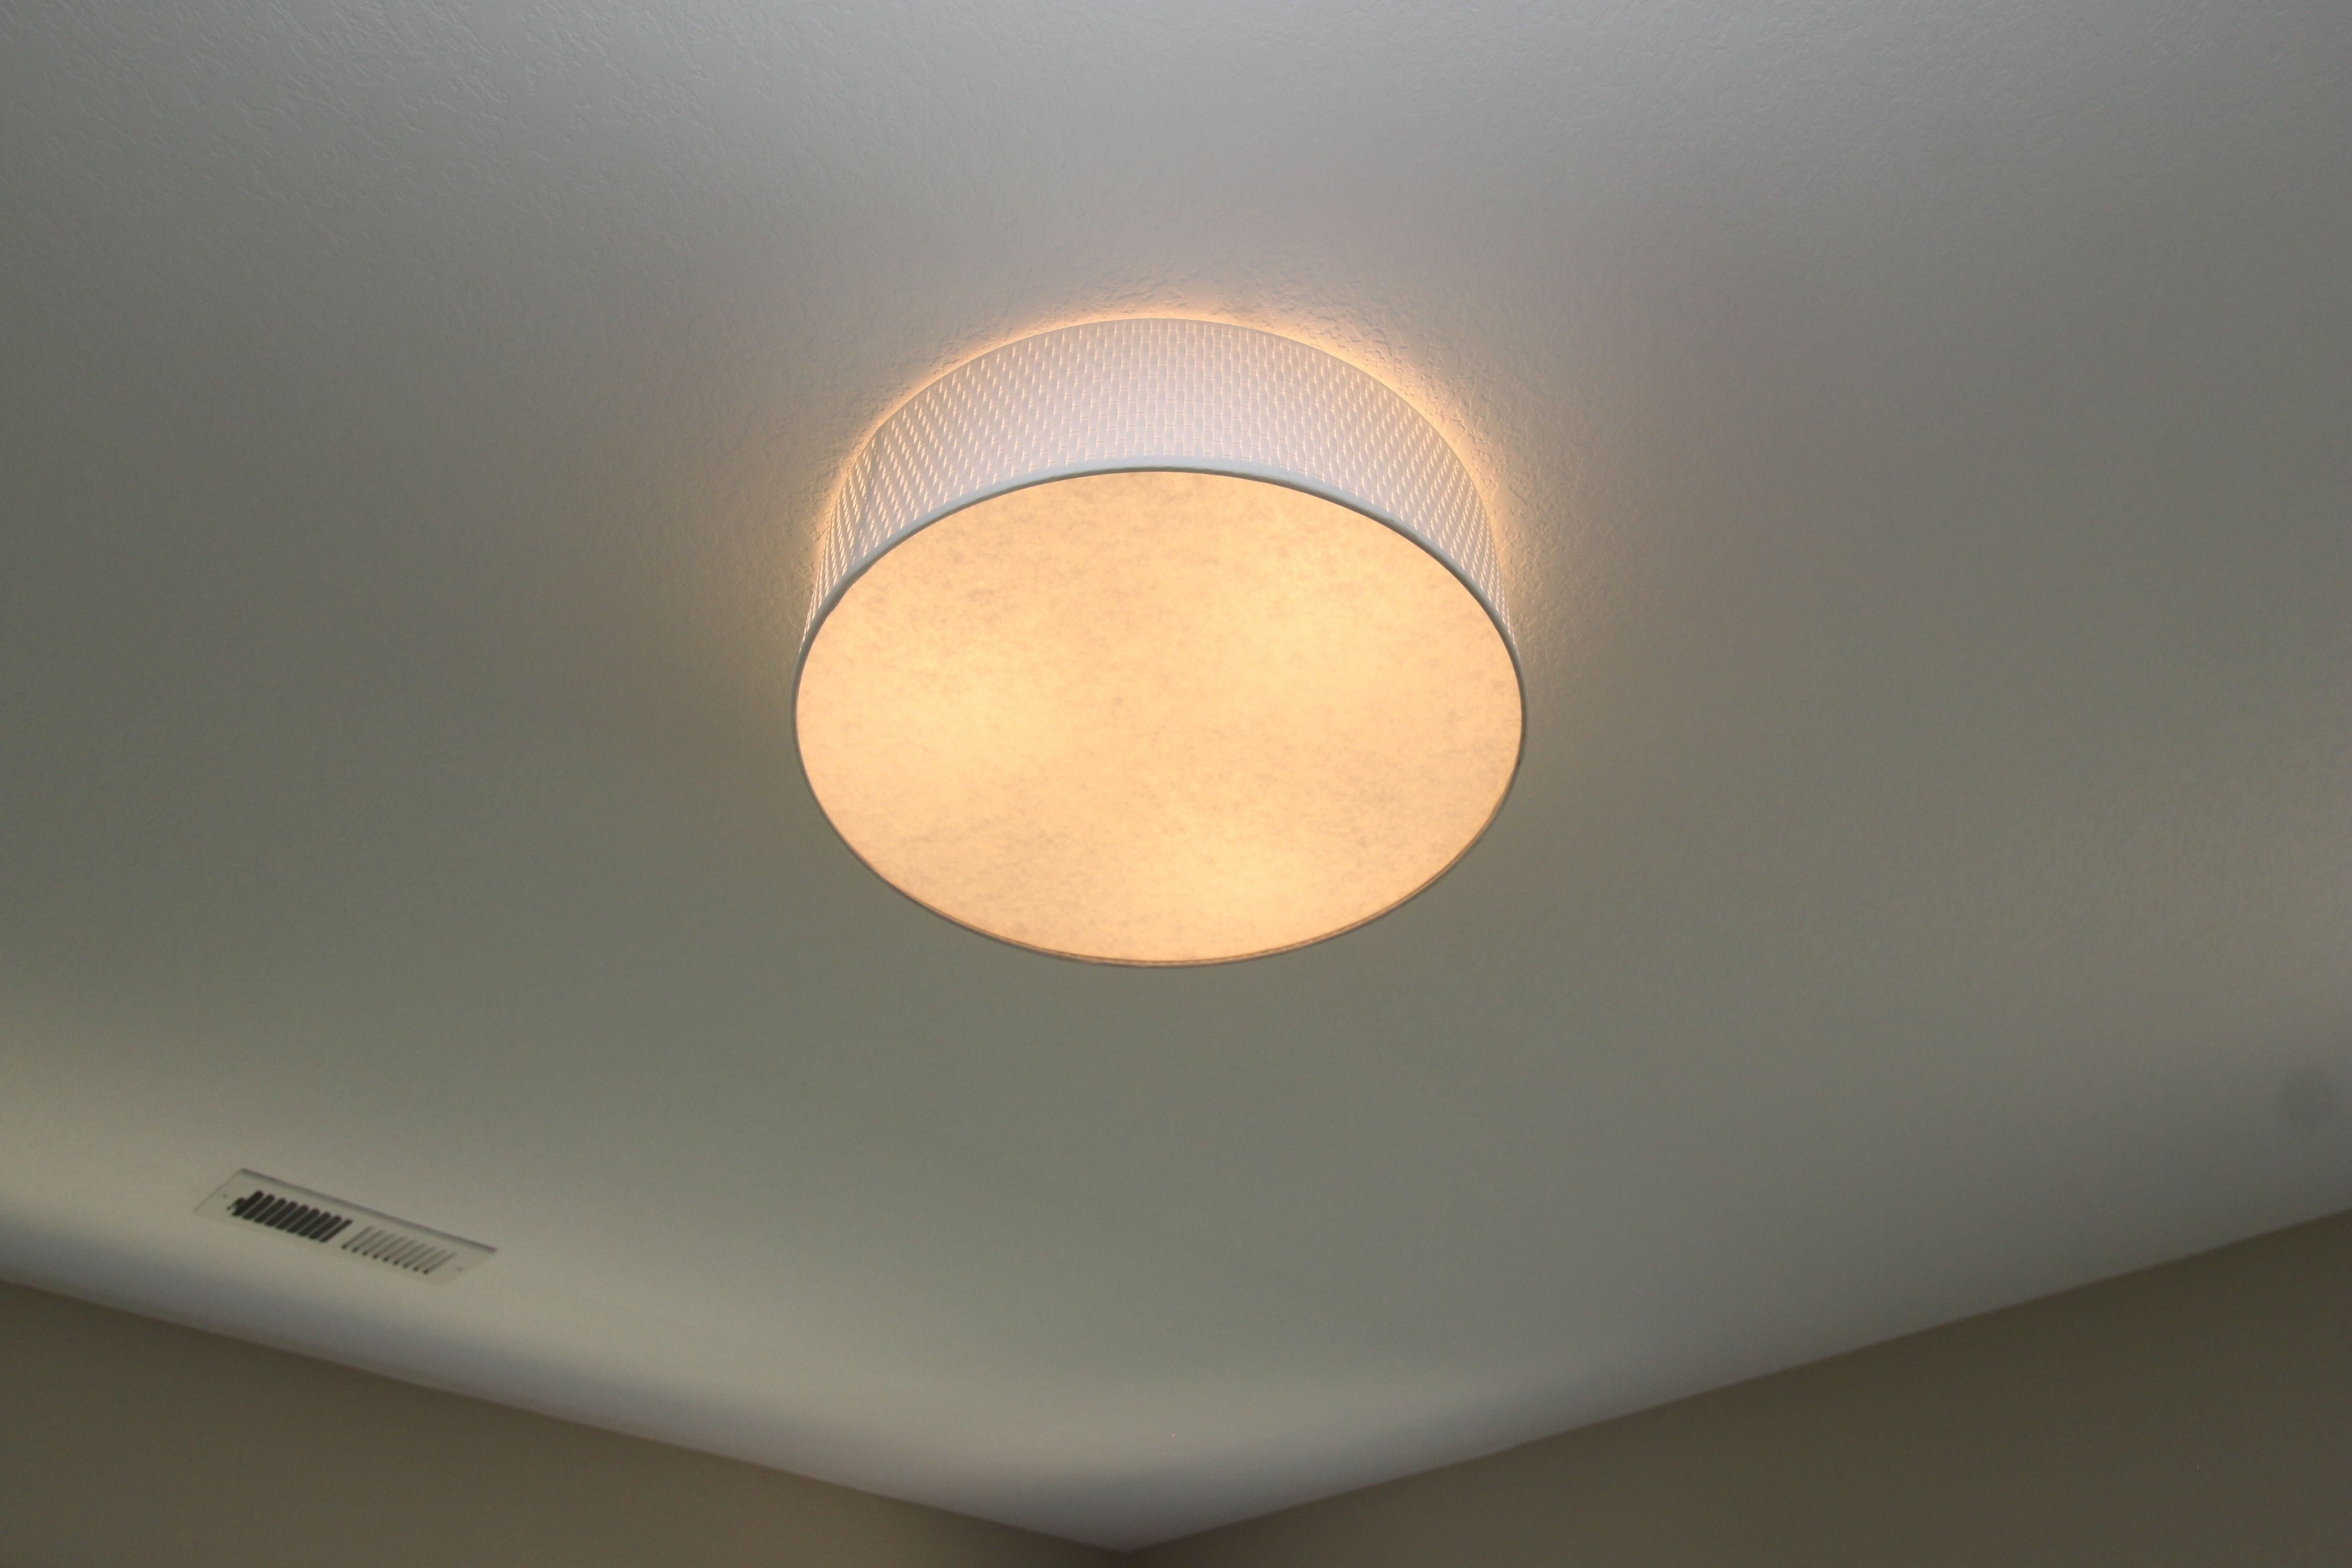 Lighting Unique Light Fixtures Unique Lighting Ceiling Lights